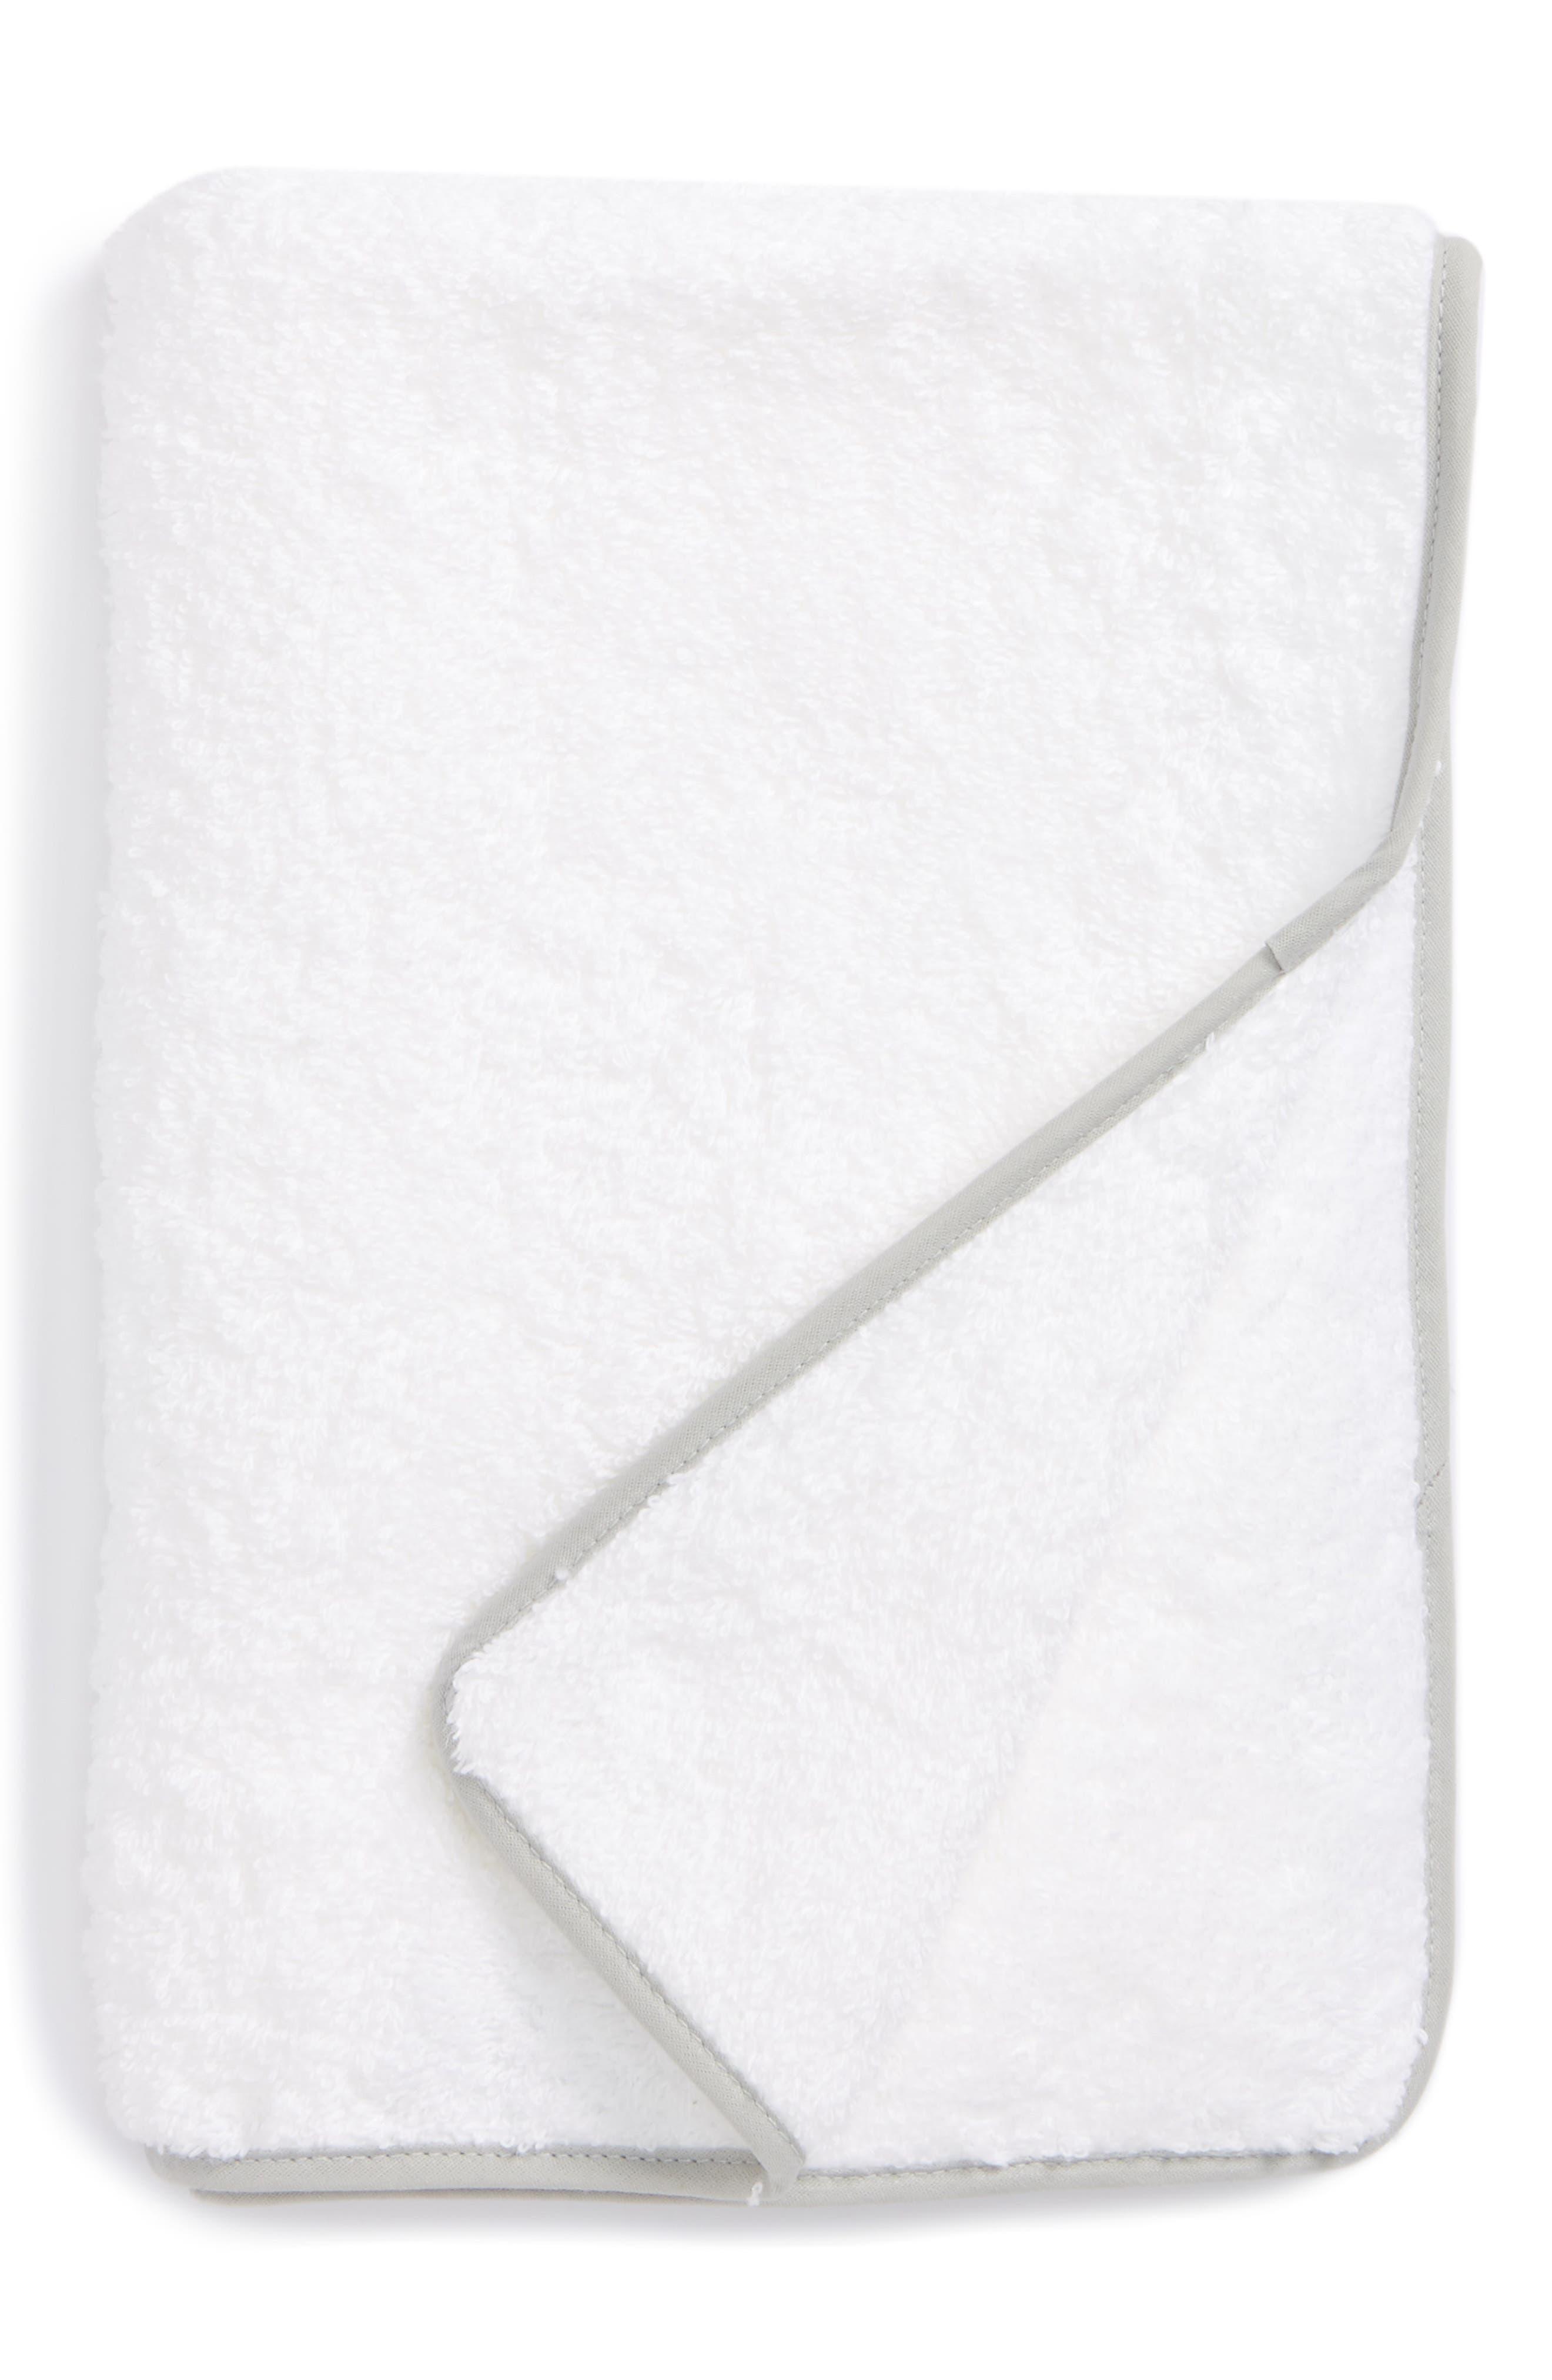 Cairo Guest Towel,                             Main thumbnail 1, color,                             040